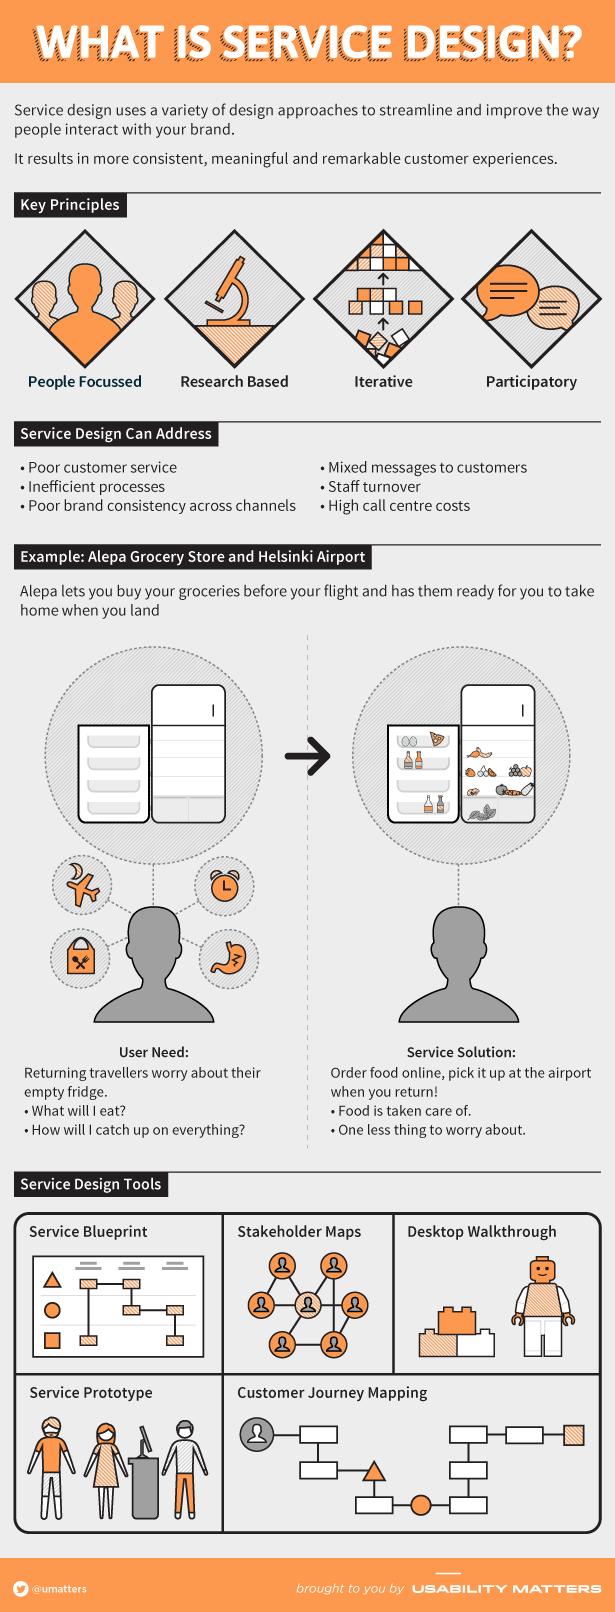 Service Design Explained Service Design Design Thinking Interactive Design